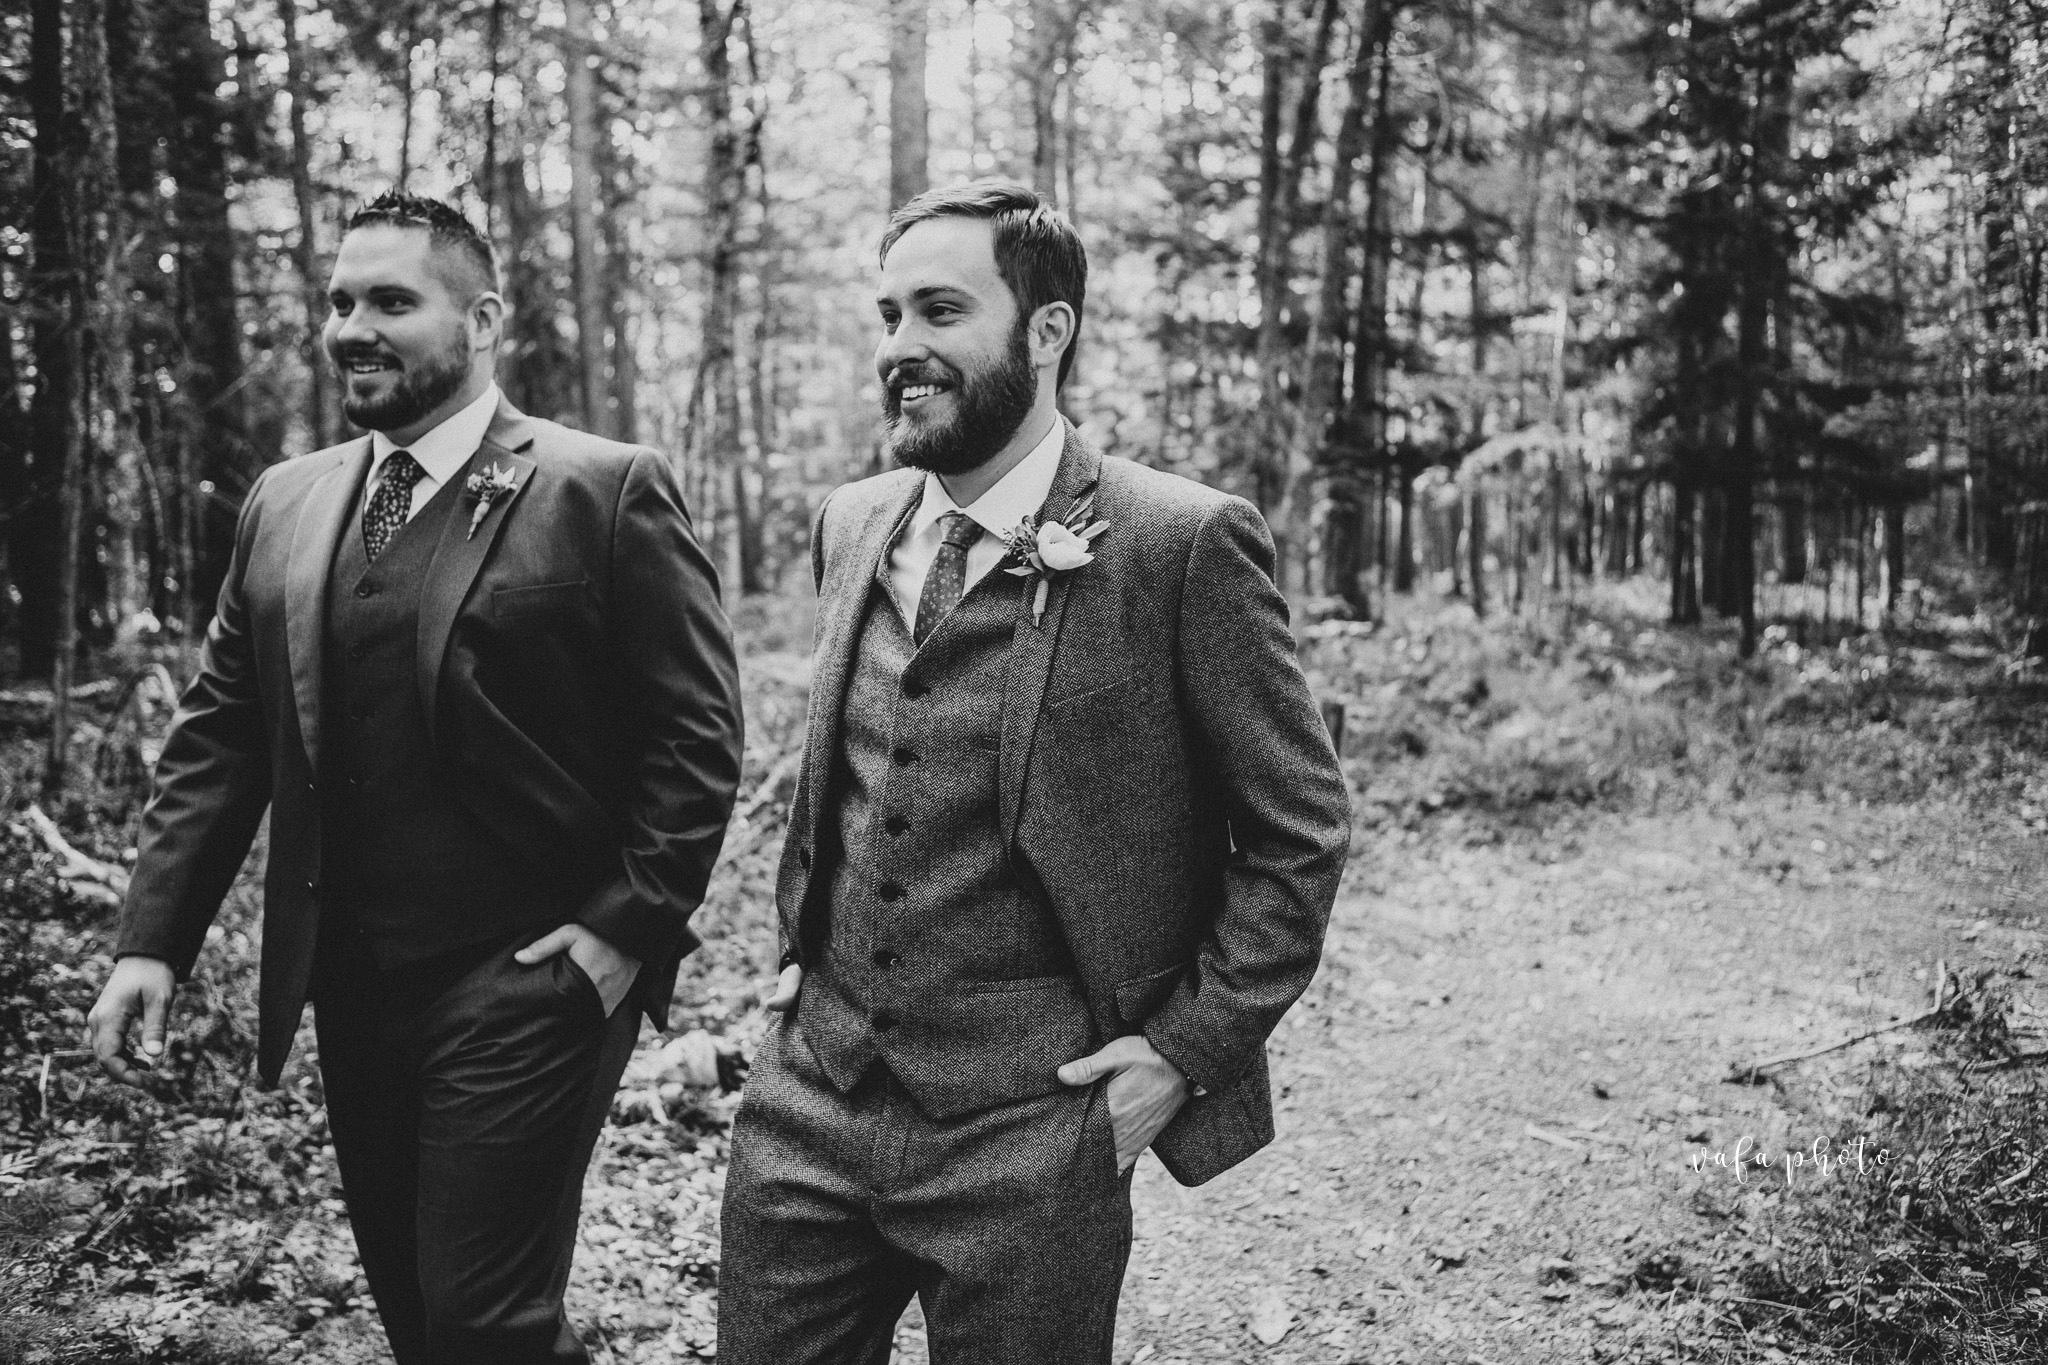 Little-Presque-Isle-Michigan-Wedding-Kim-Kyle-Vafa-Photo-149.jpg